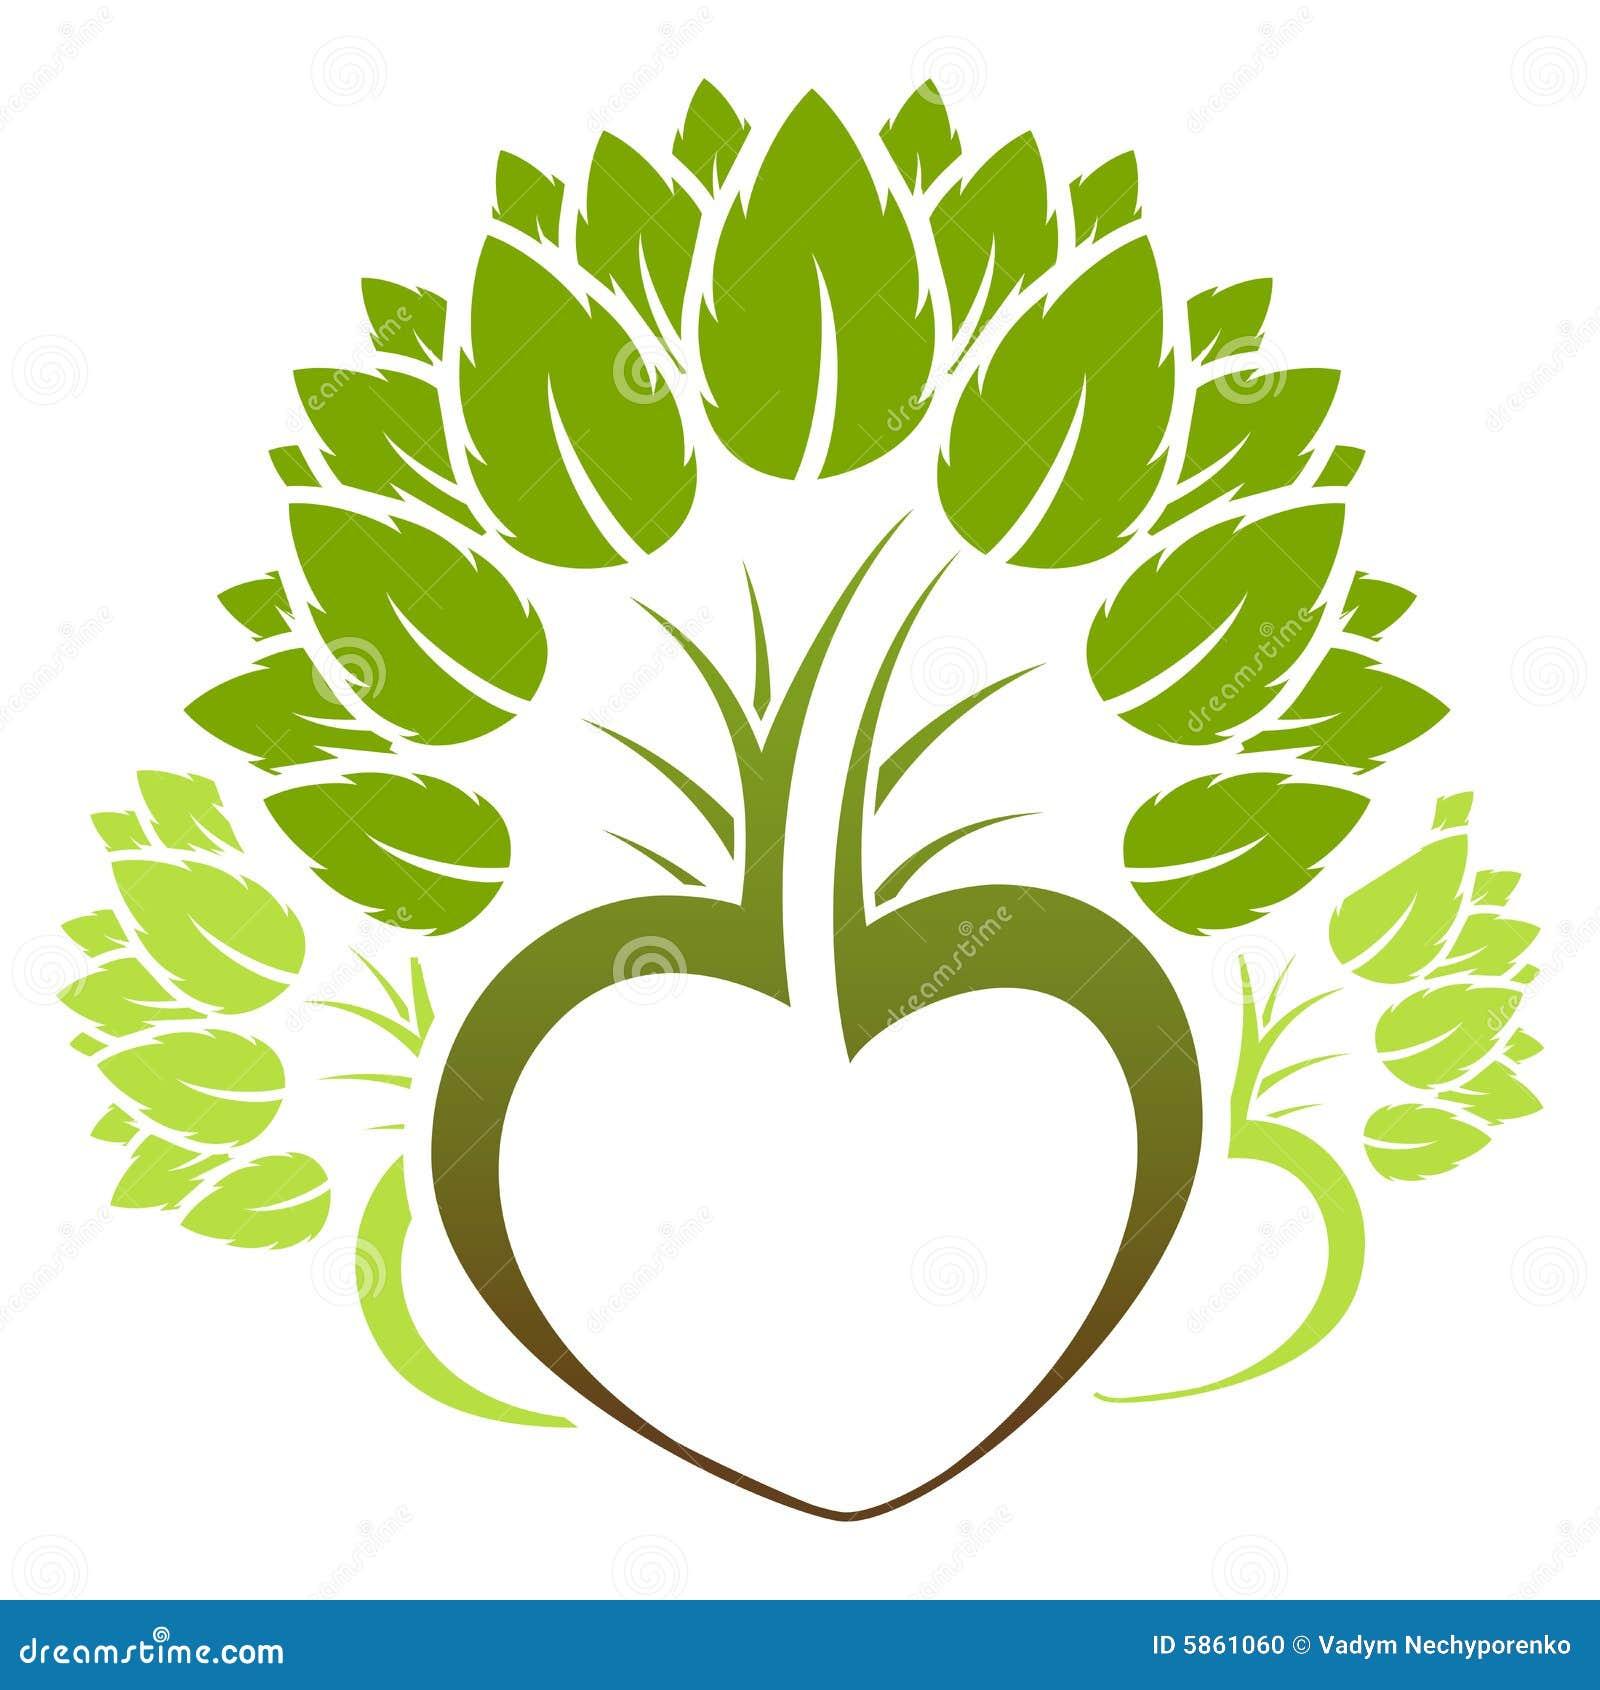 Abstract Green Tree Icon Logo Stock Vector - Illustration of health ...